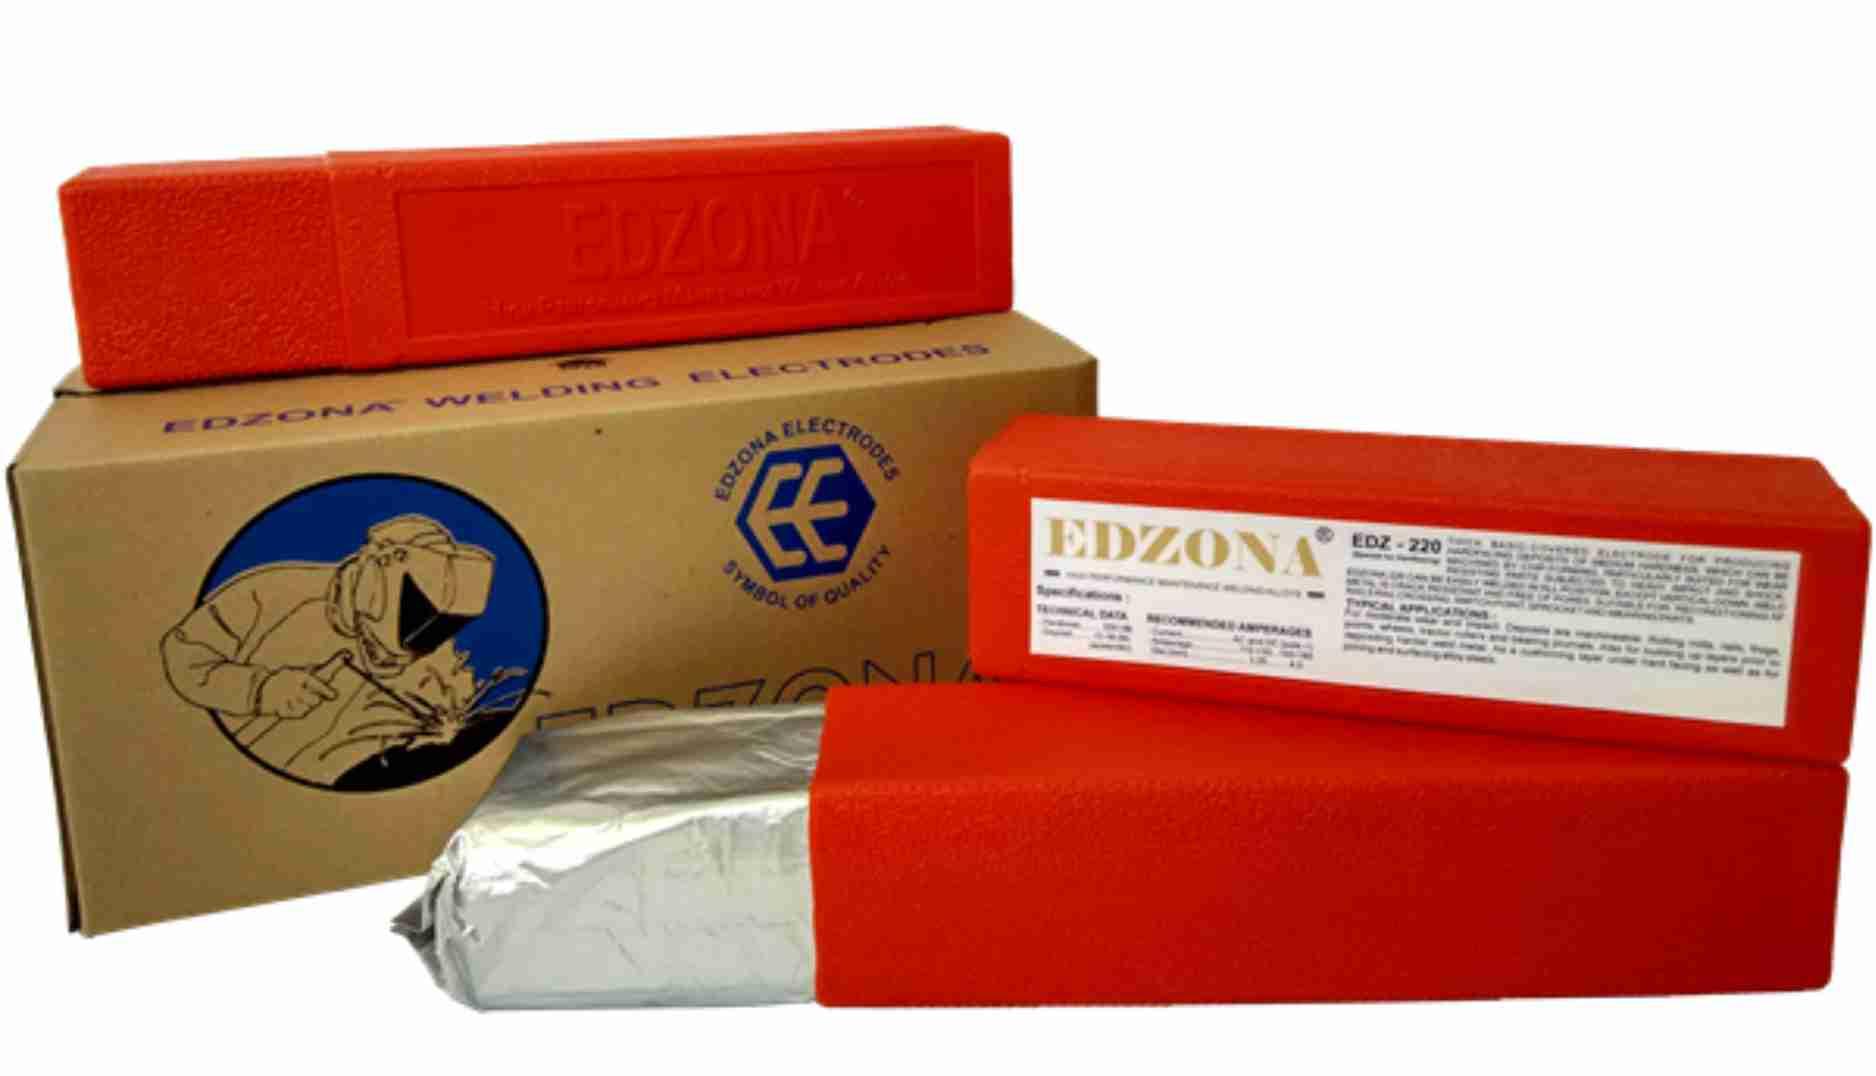 KAWAT LAS HARDFACING EDZONA-220